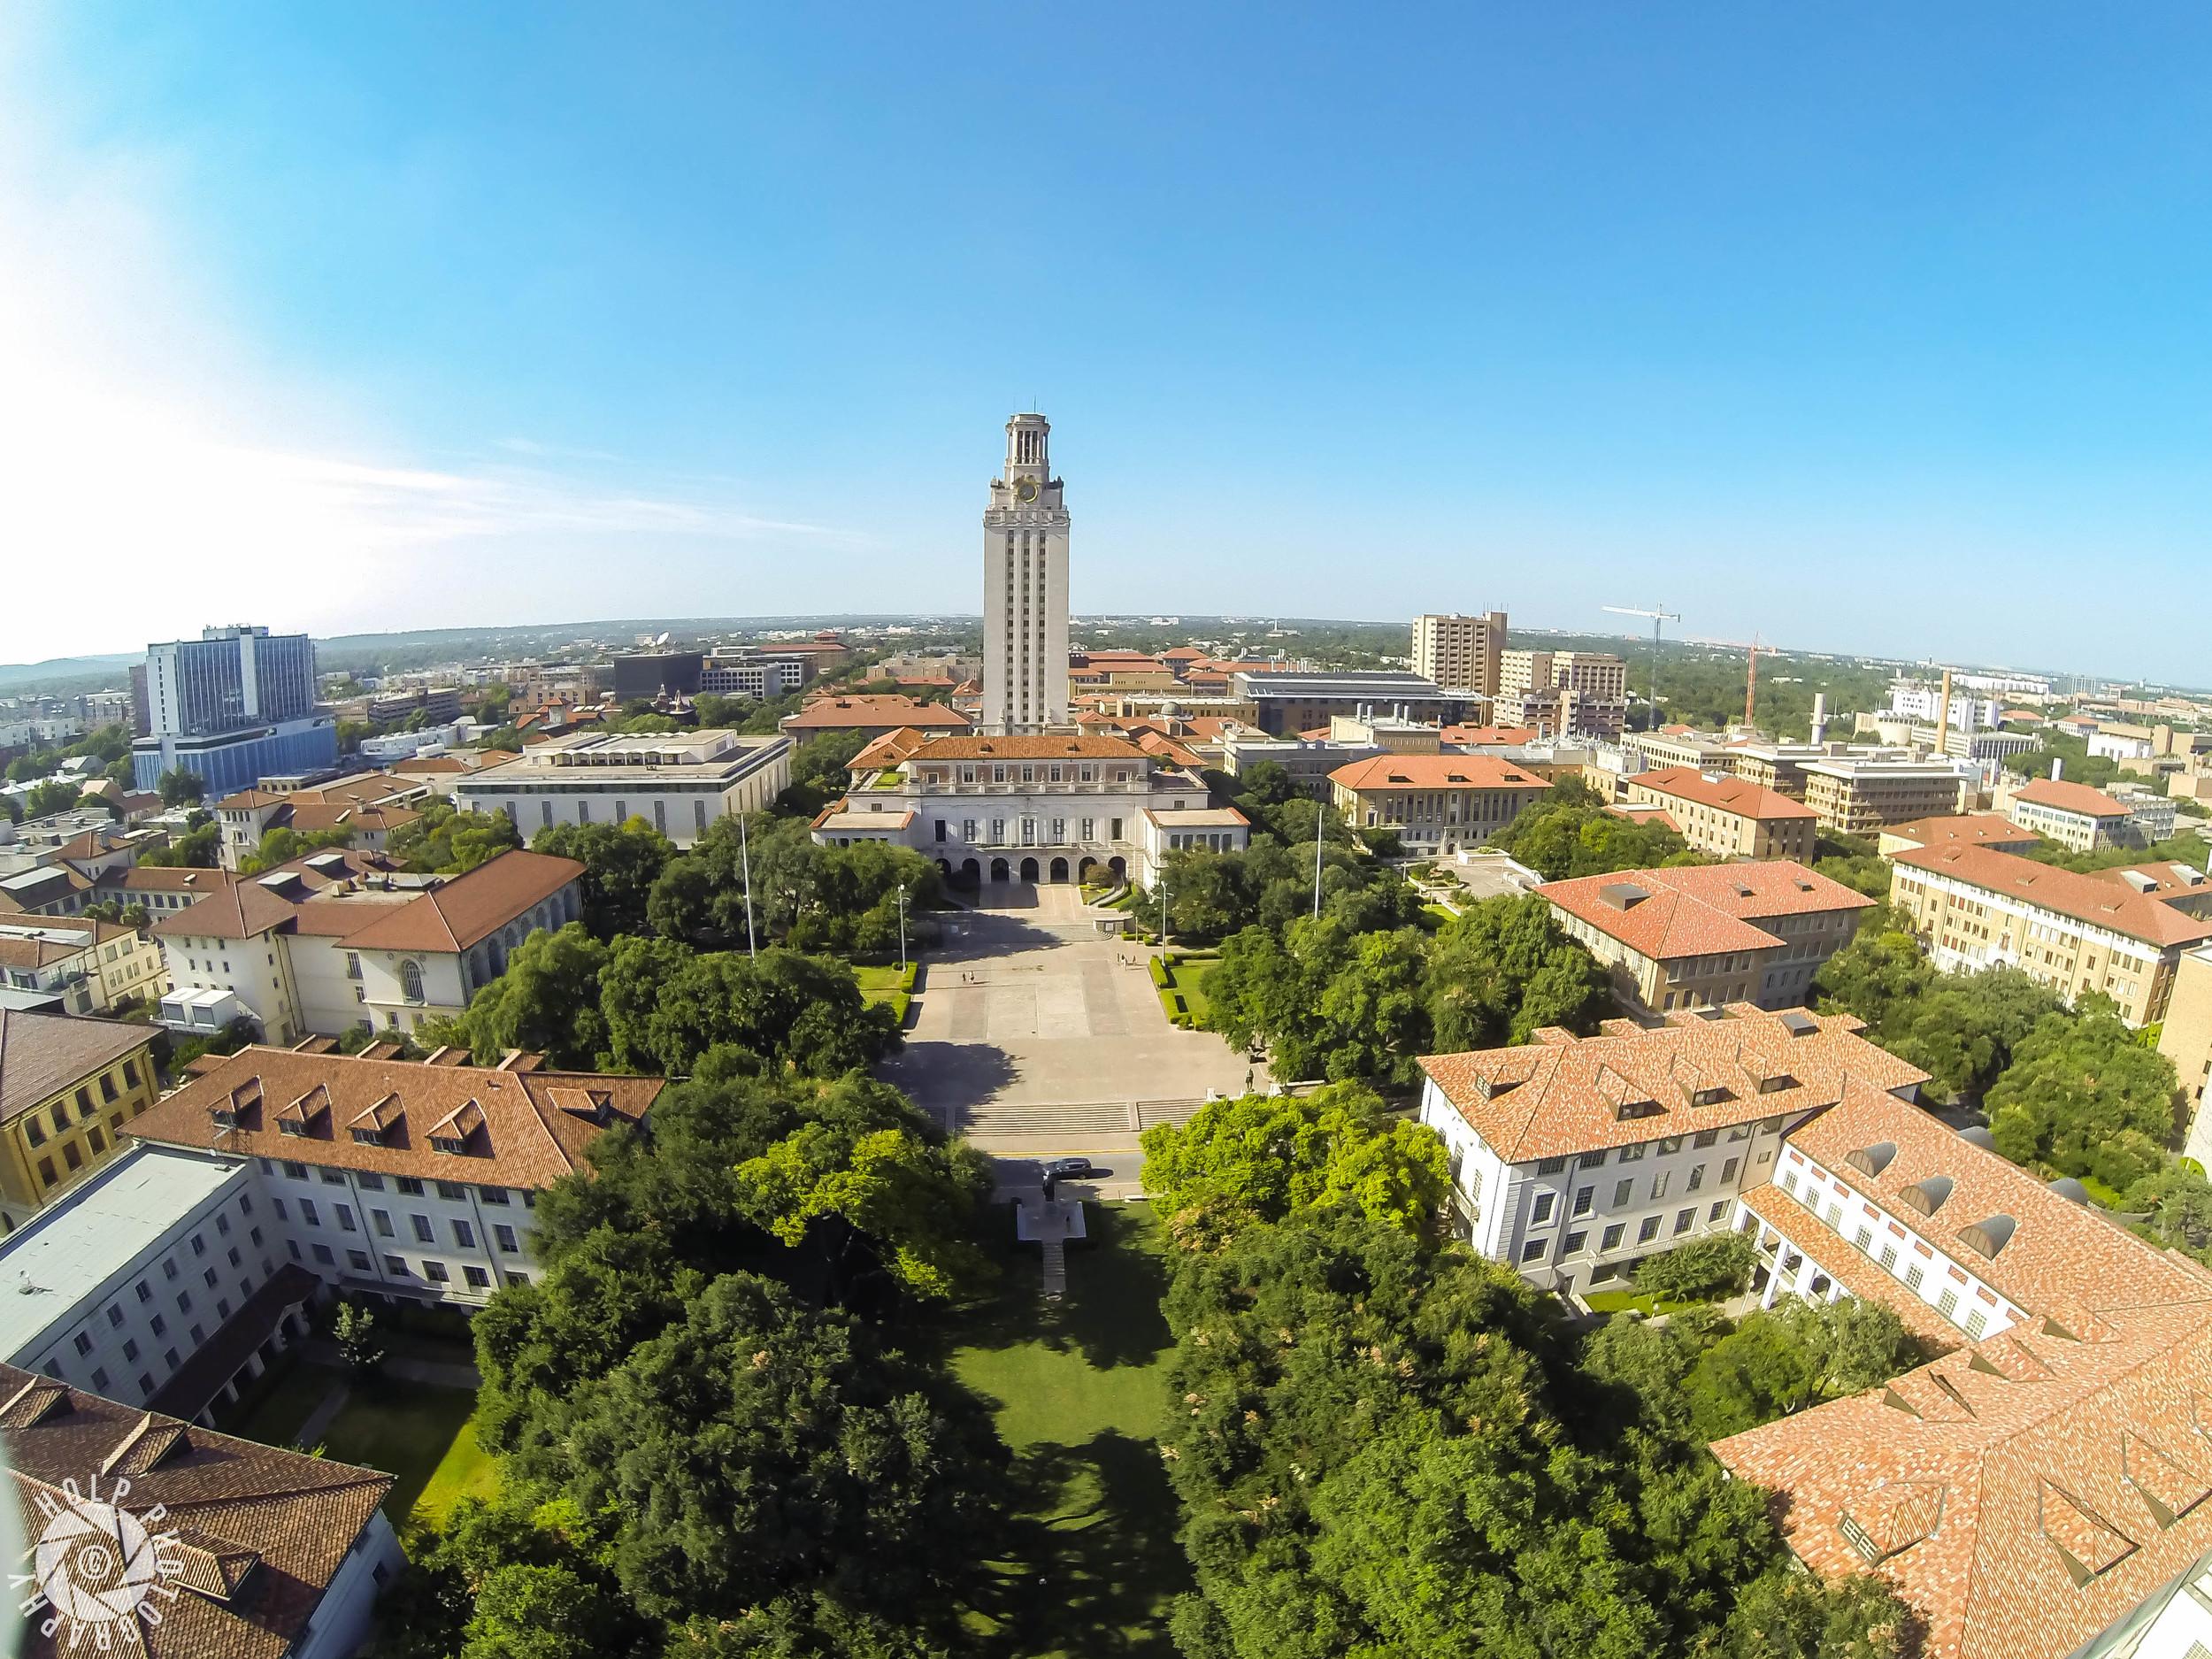 University of Texas ( UTexas )